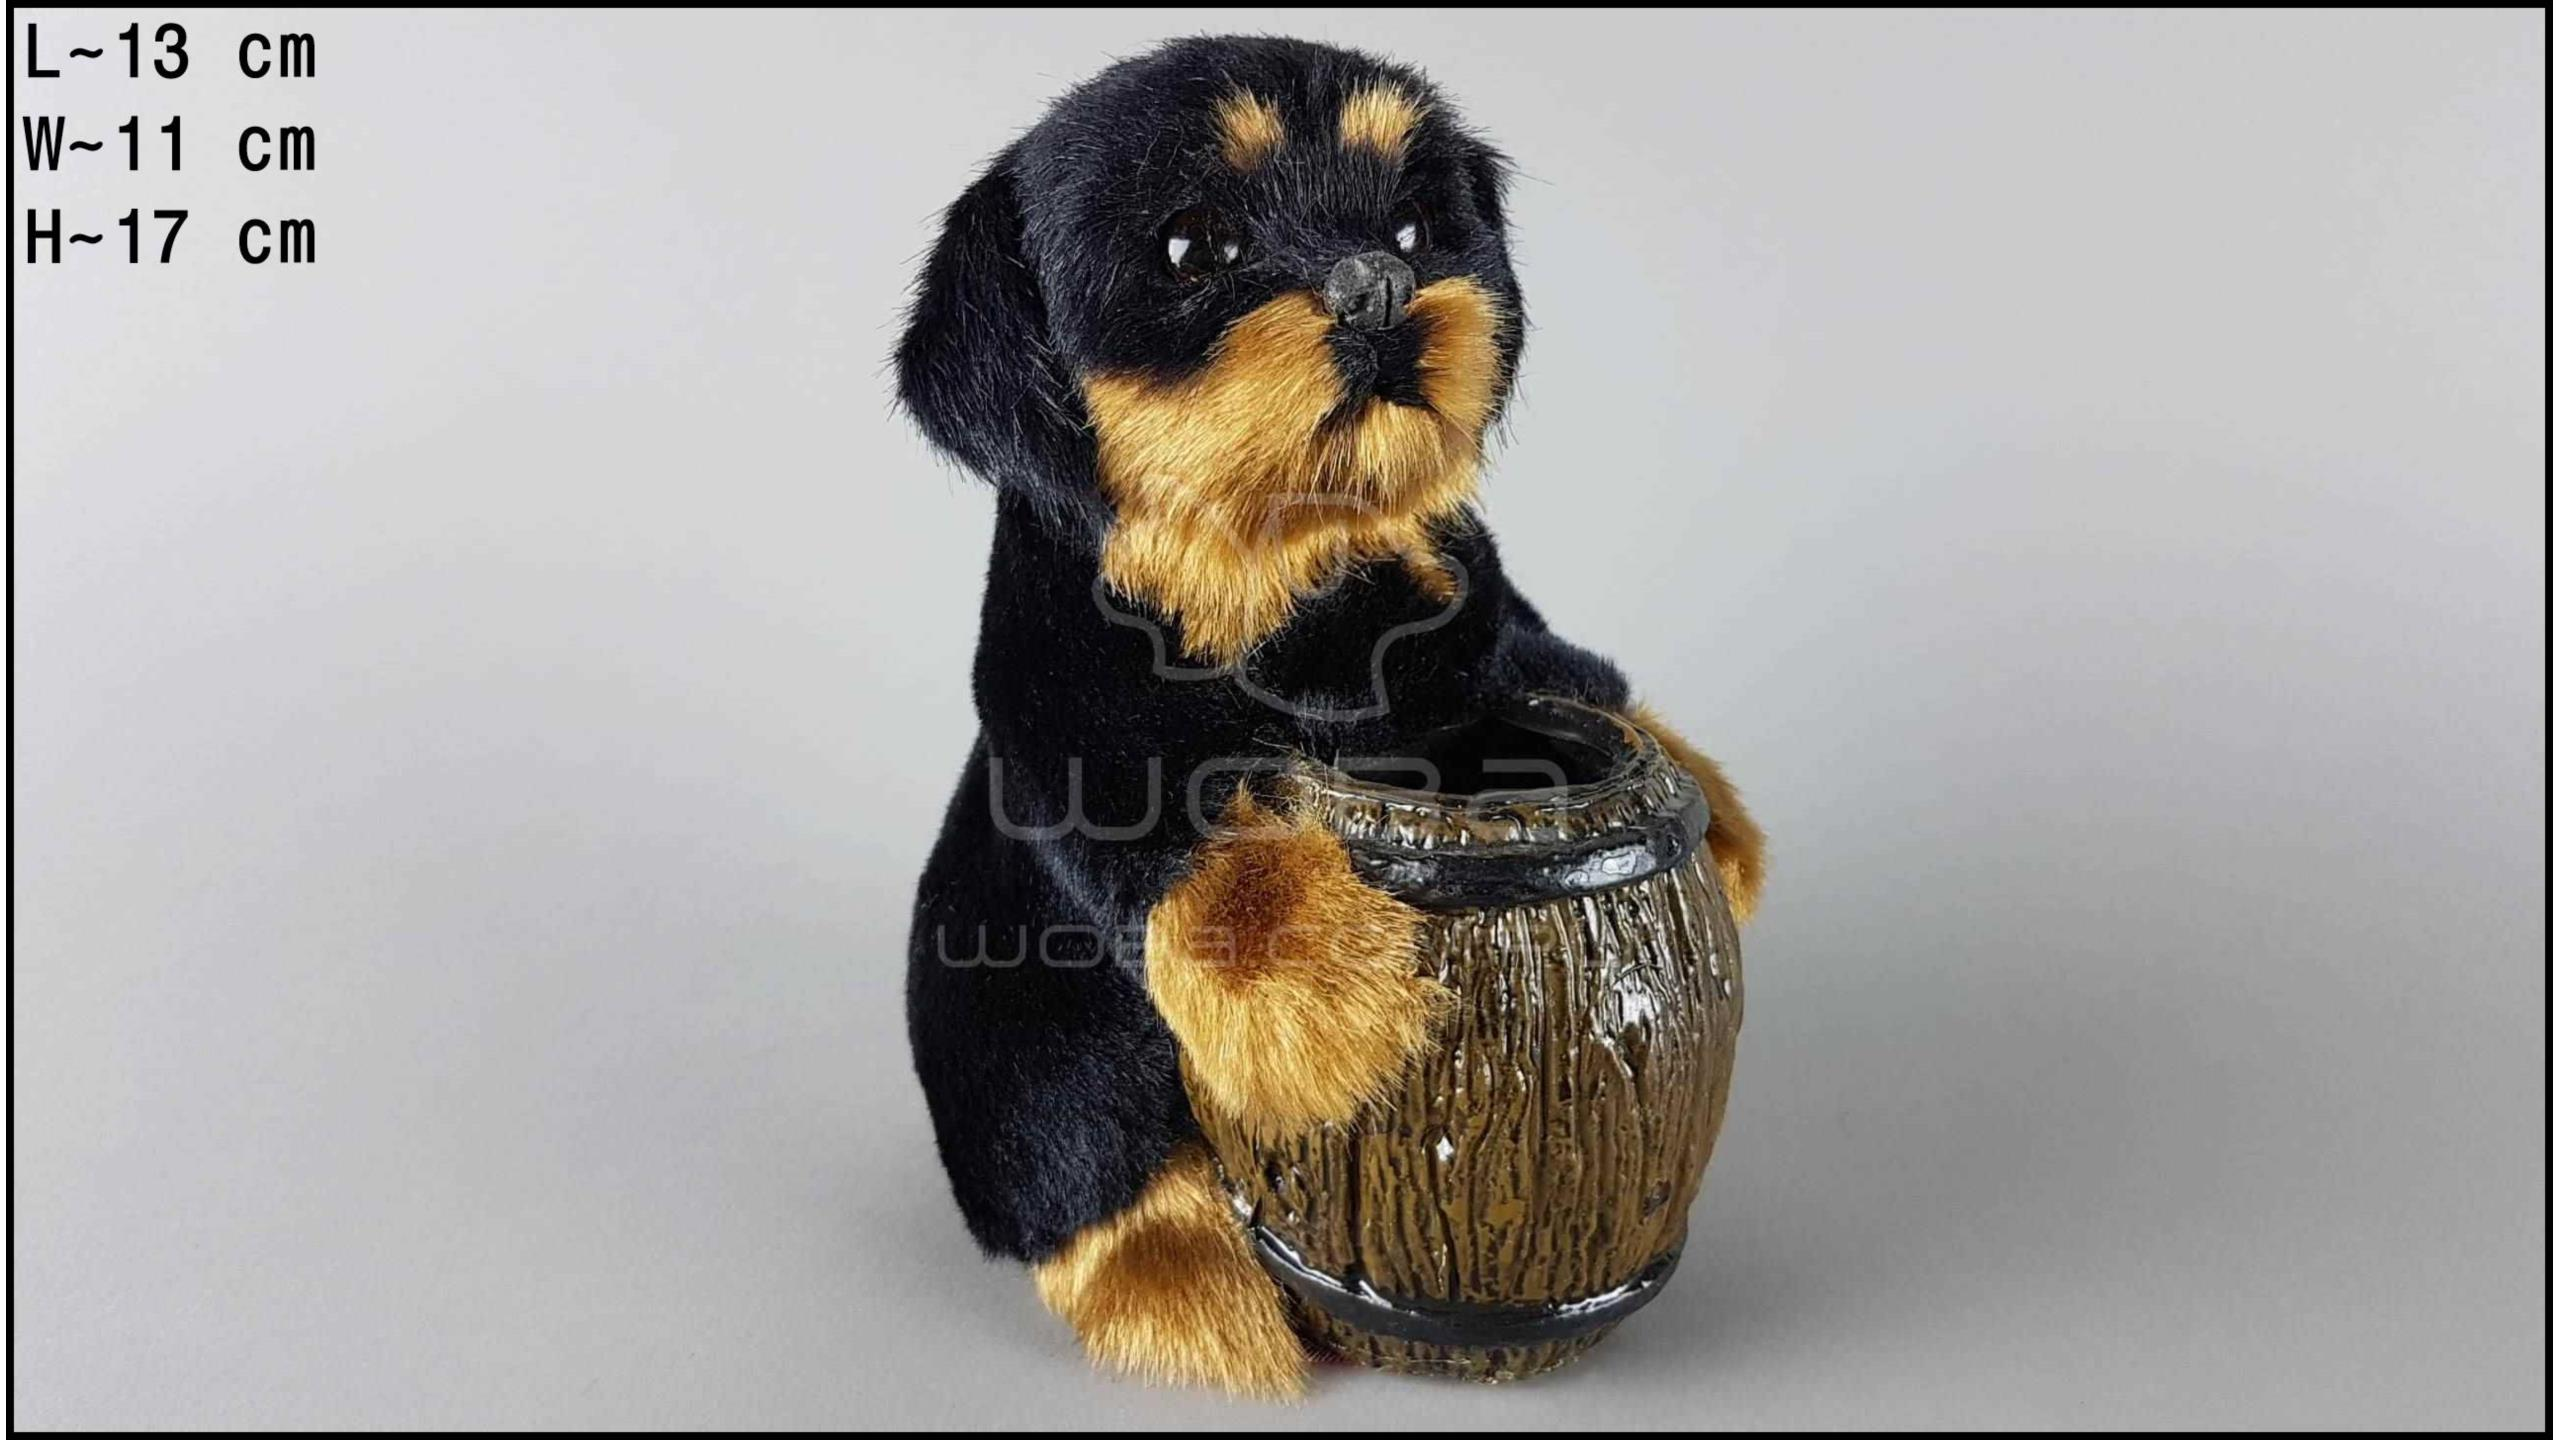 Pies z beczką - Rottweiler